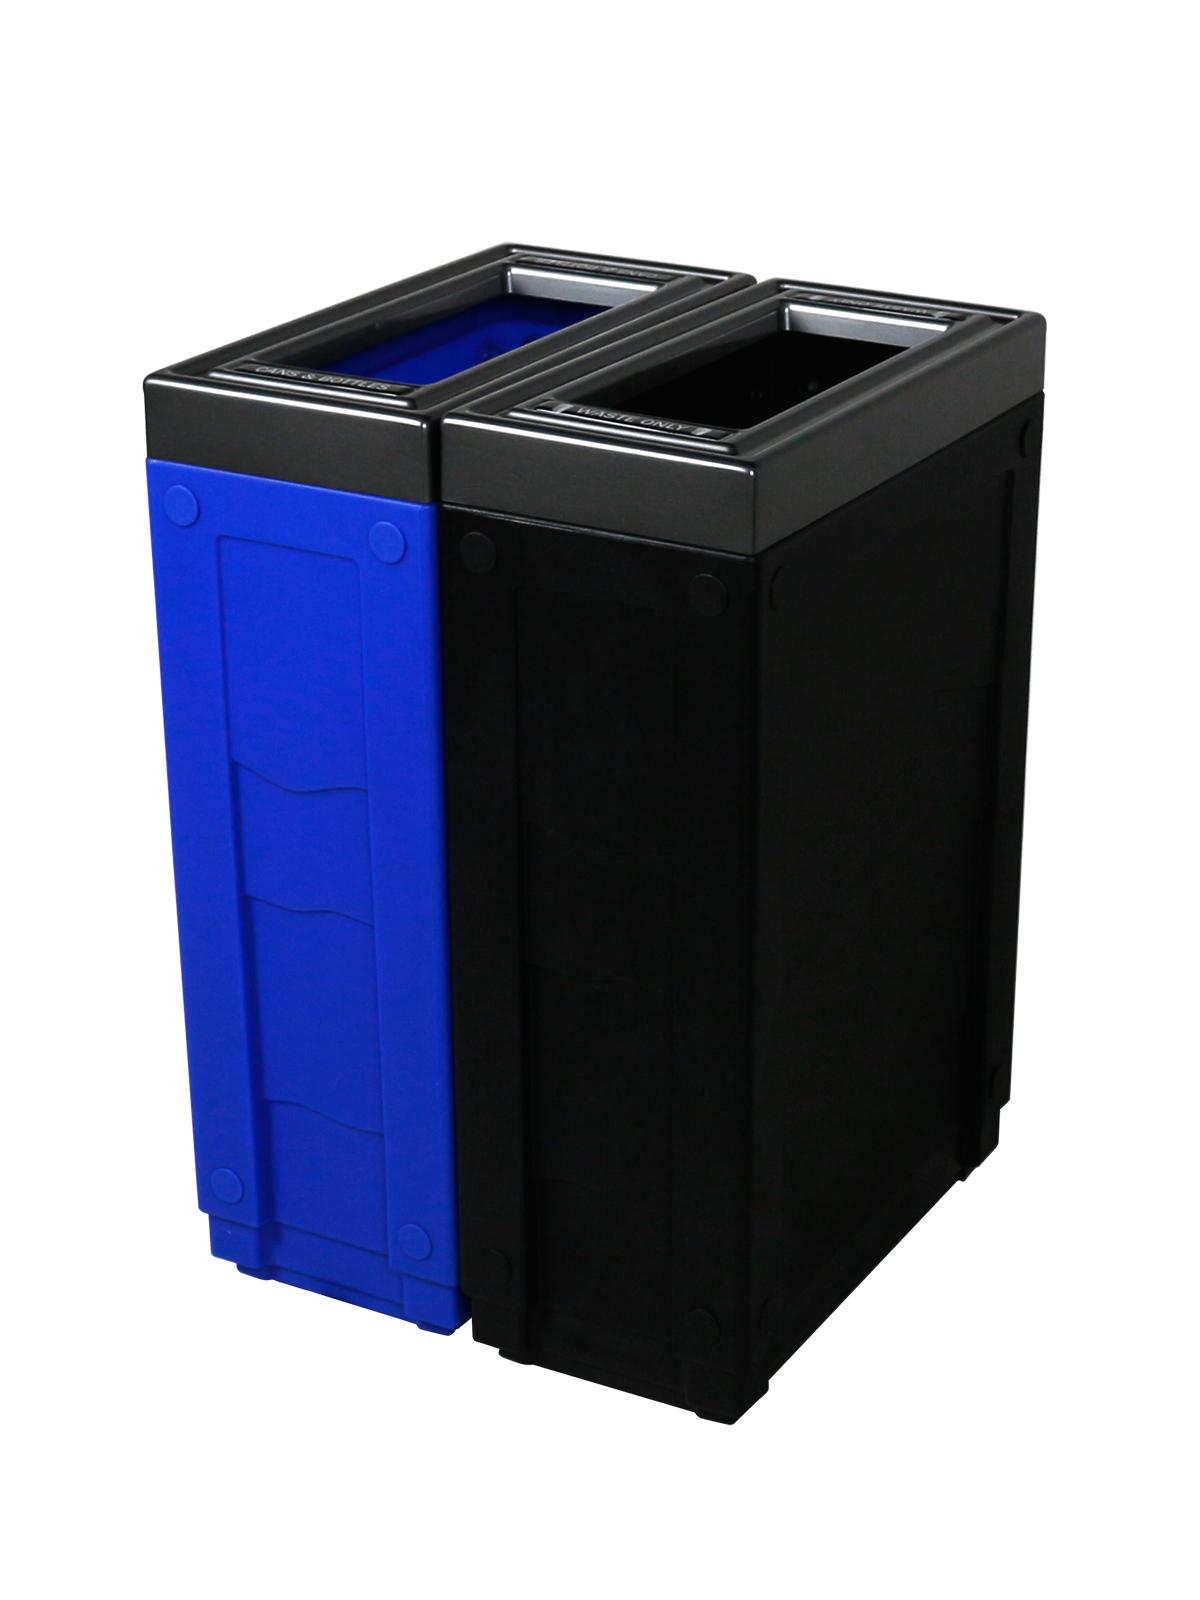 EVOLVE - Double - Cans & Bottles-Waste - Full - Blue-Black